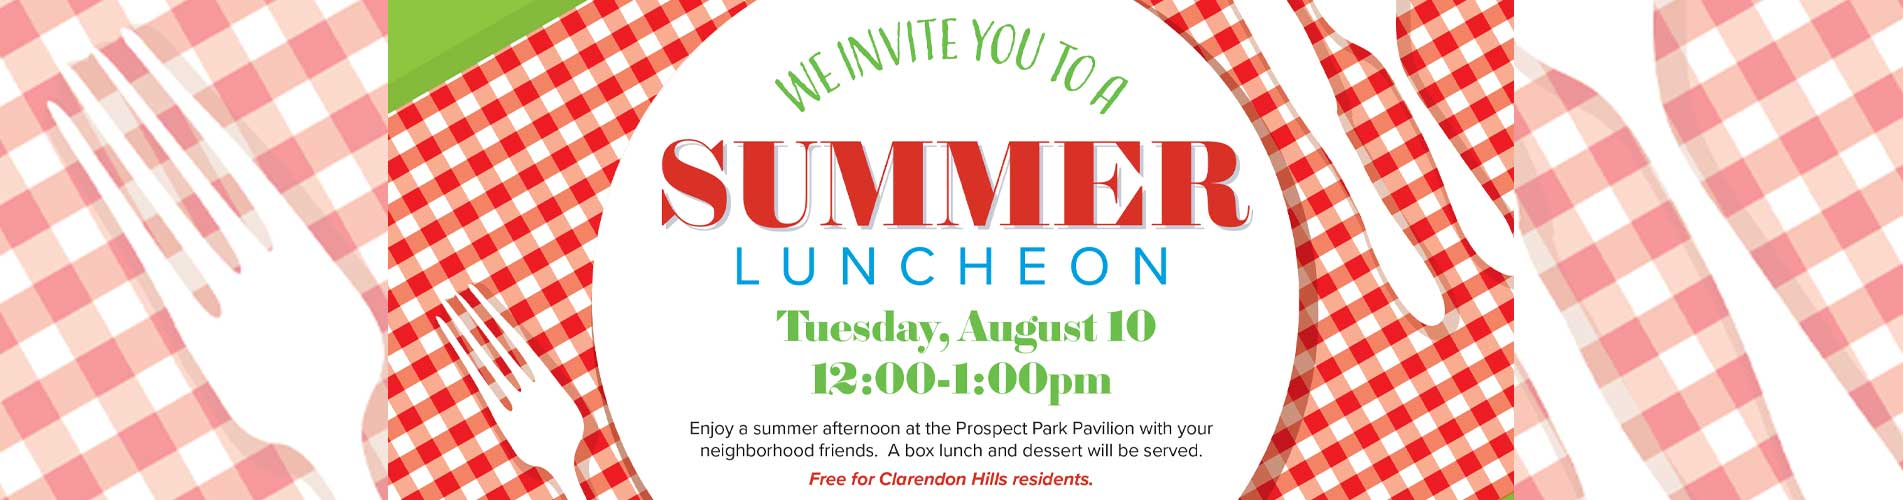 Summer Luncheon